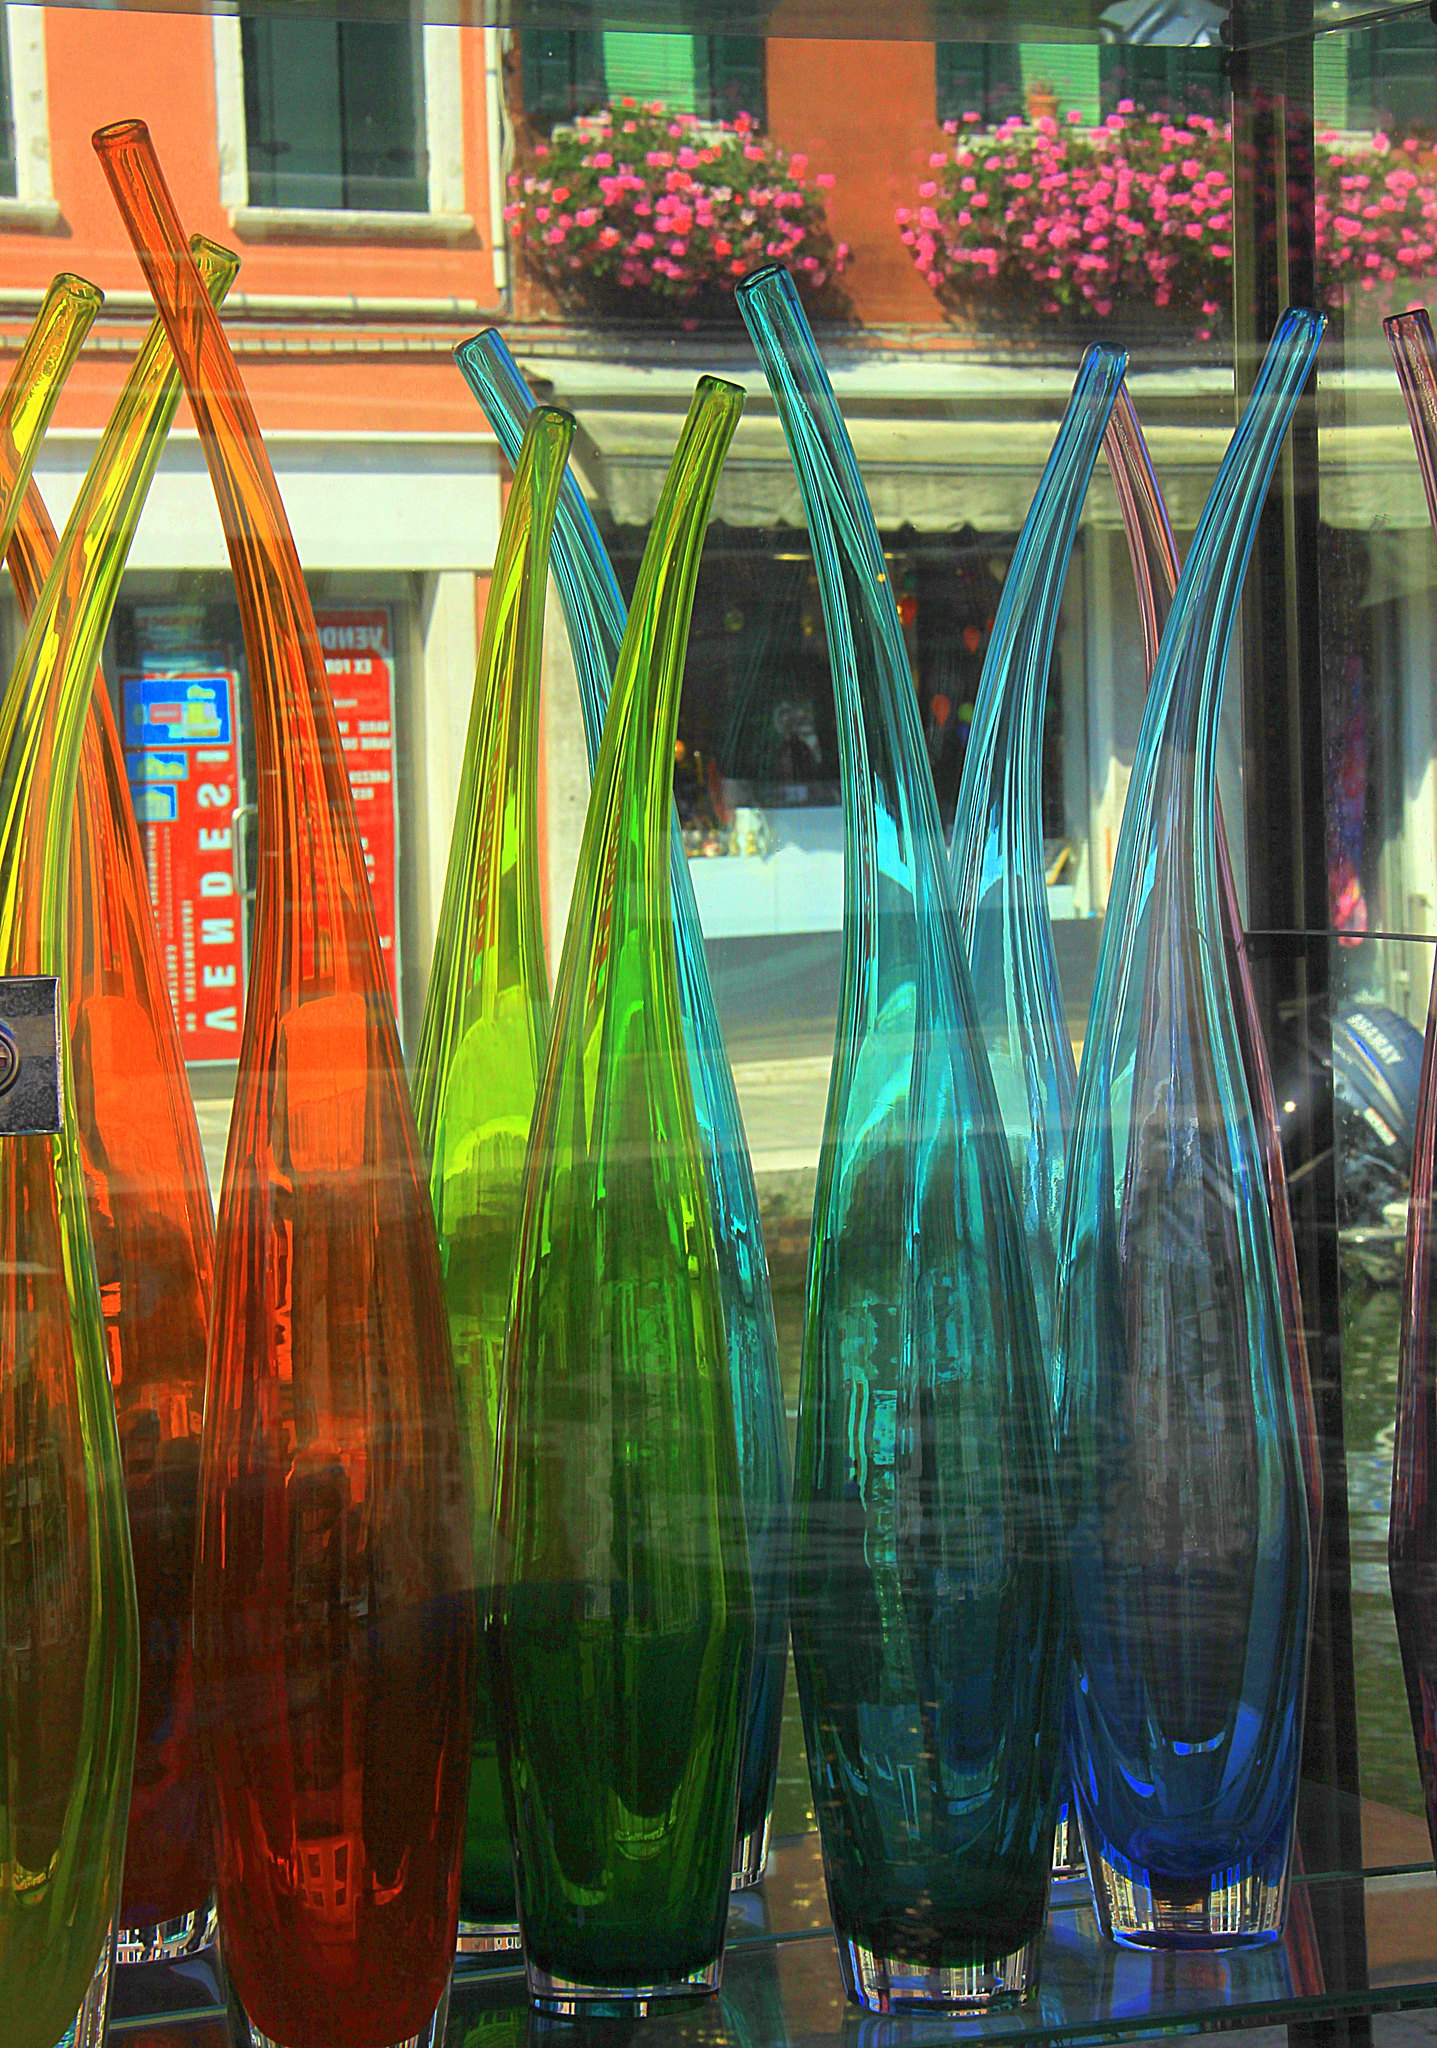 Shop window display at Murano